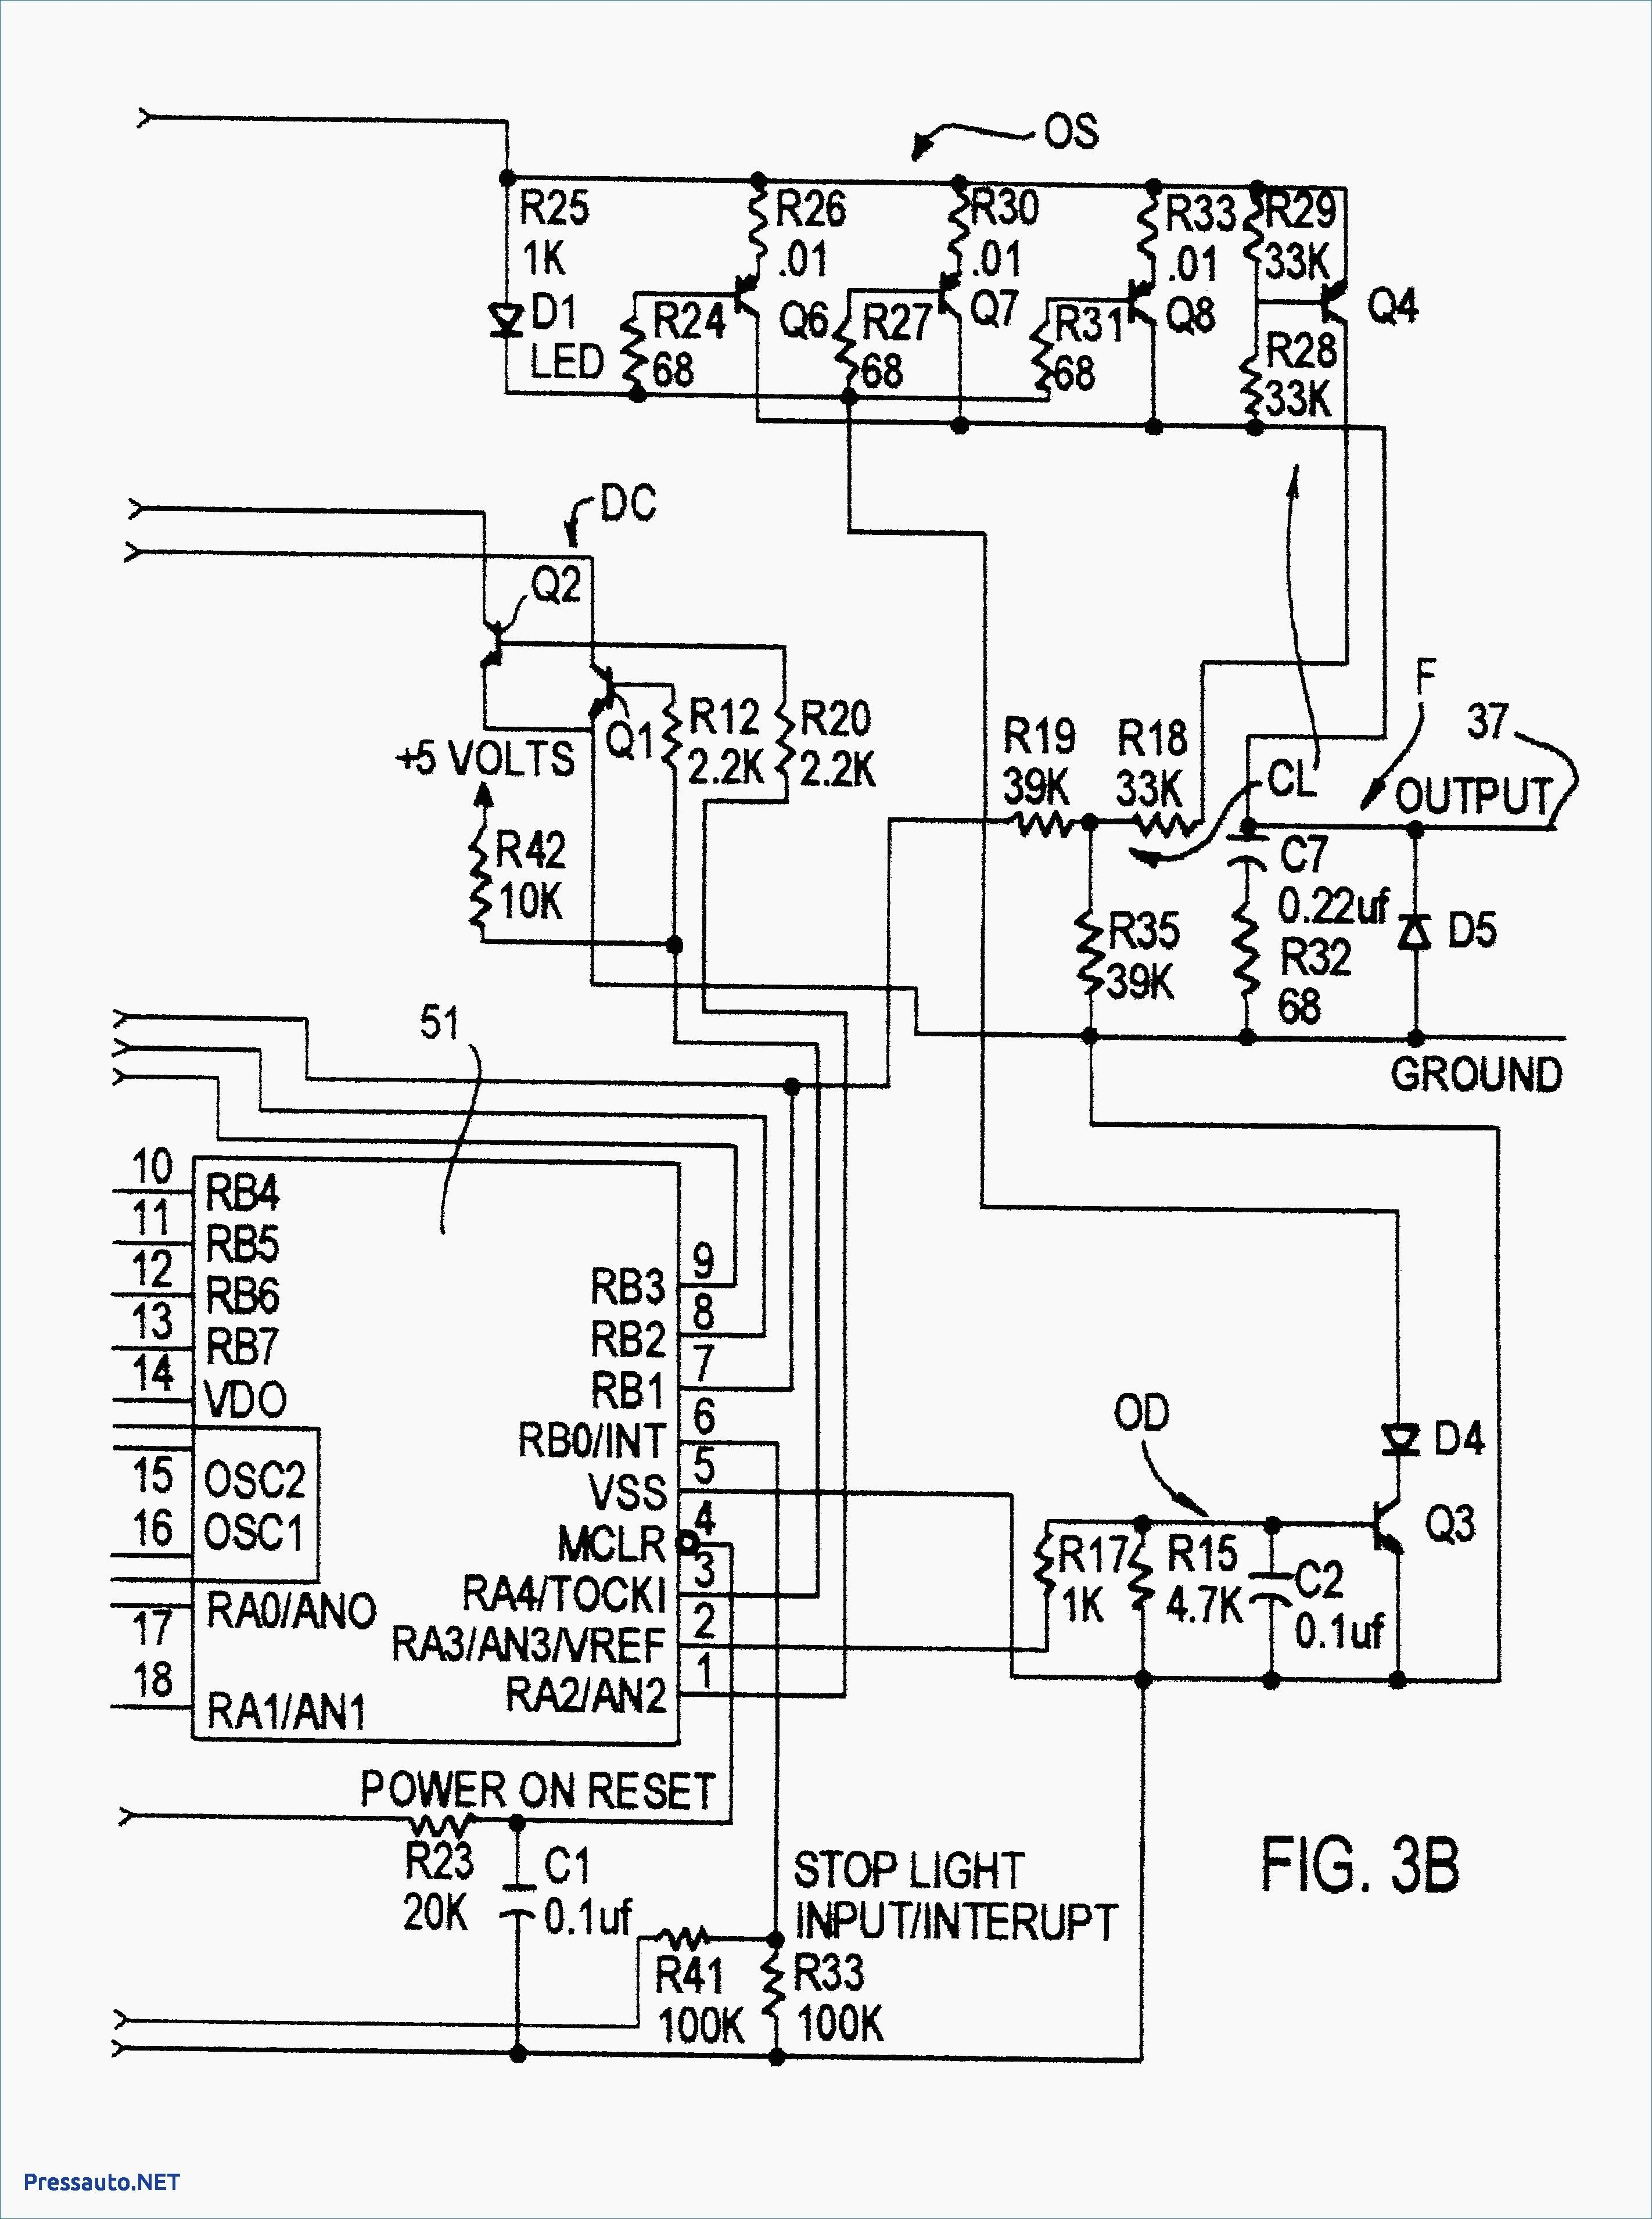 Electric Range Wiring Diagrams In